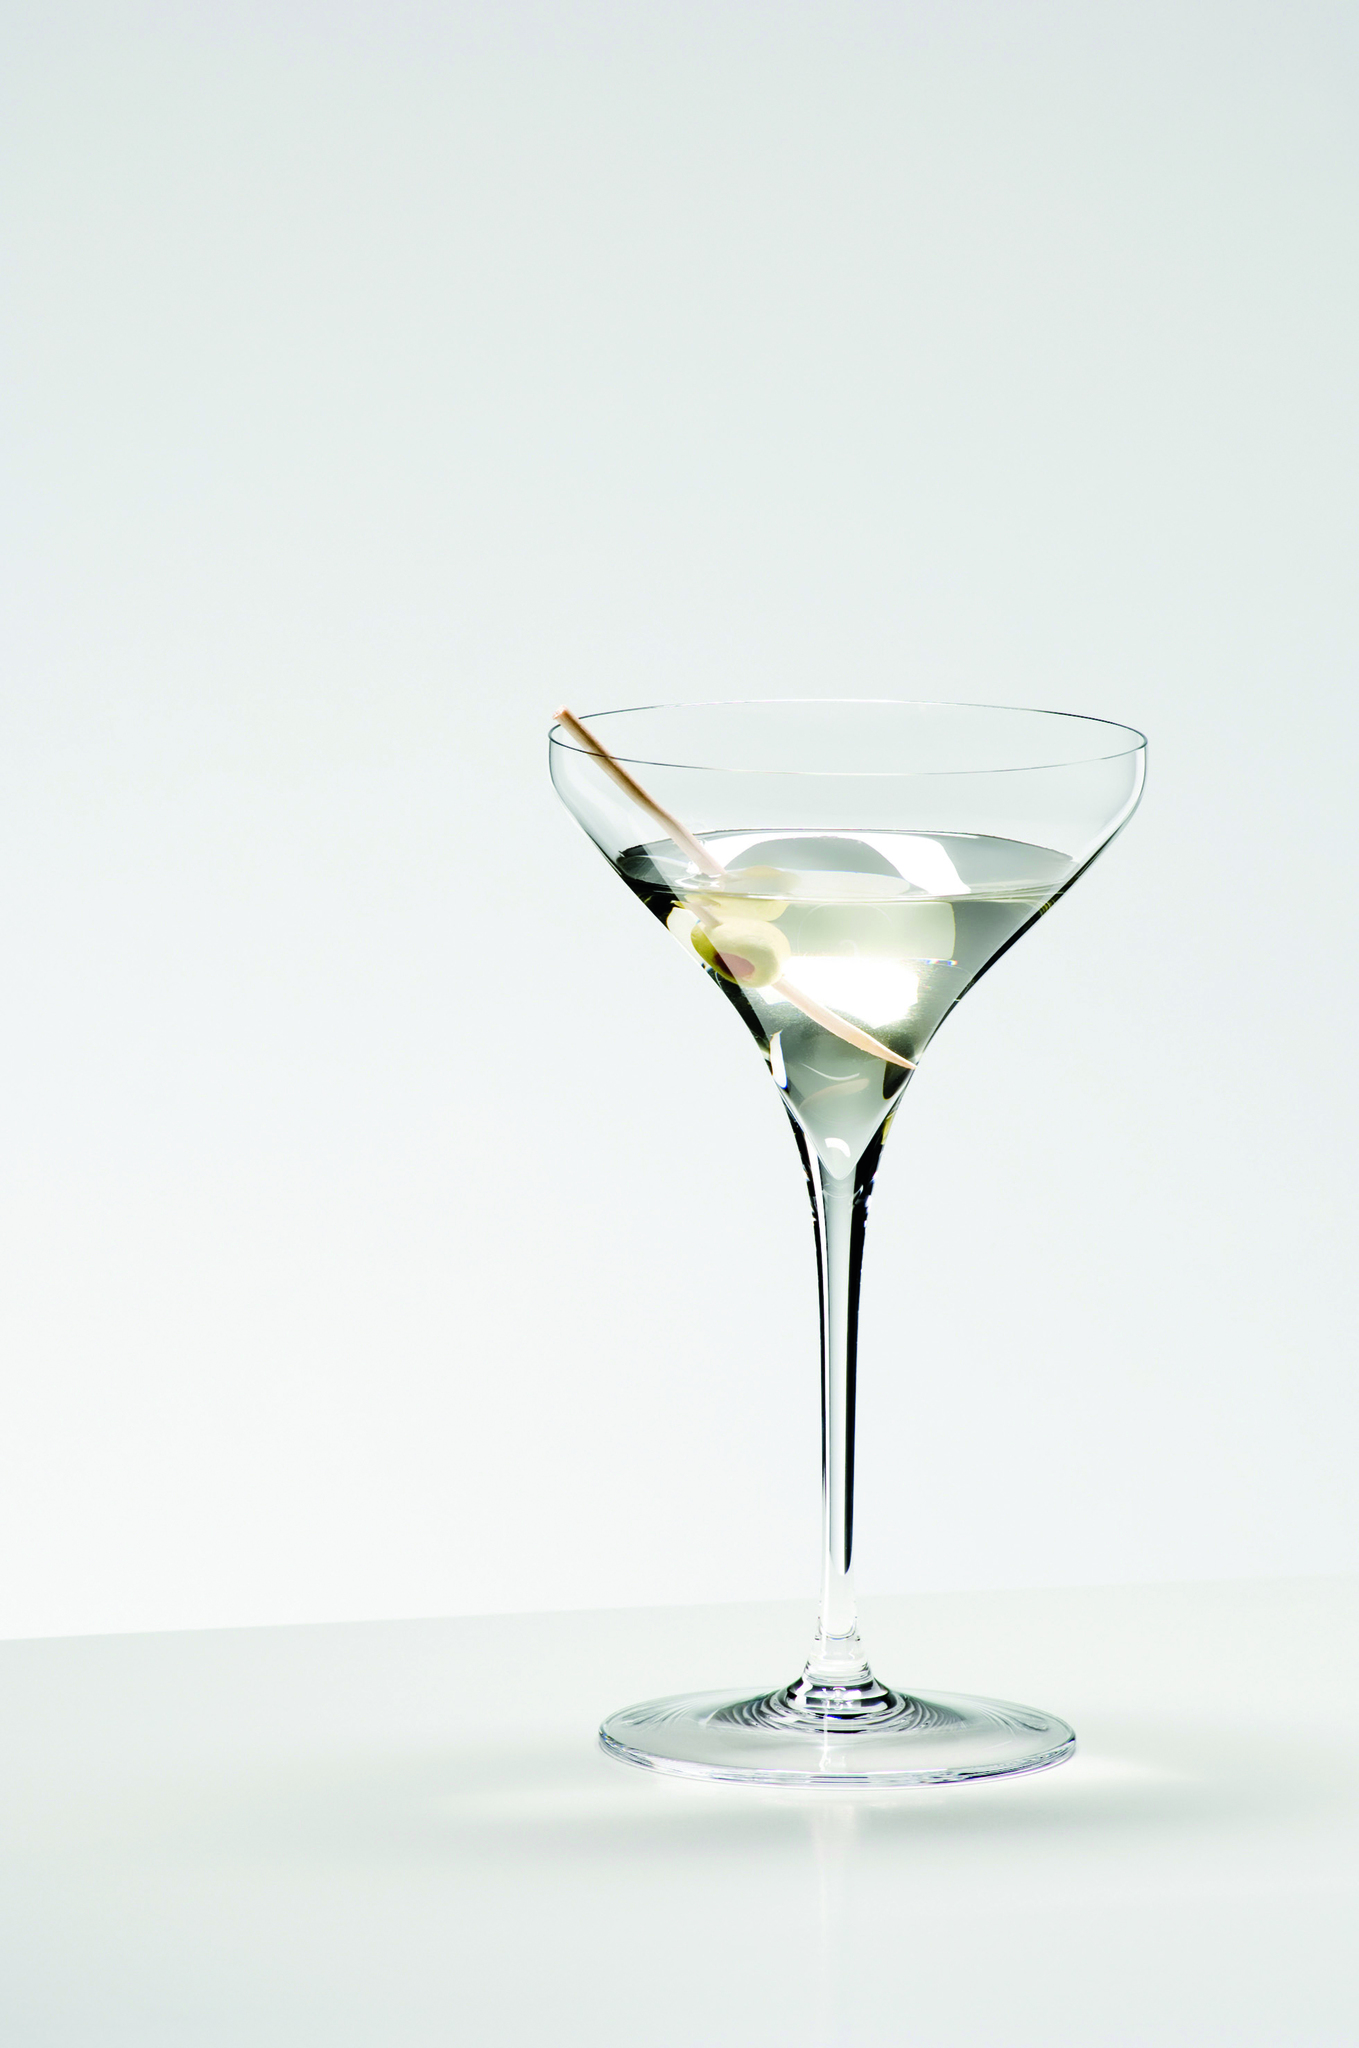 Бокалы Набор бокалов для мартини 2шт 270мл Riedel Vitis Martini nabor-bokalov-dlya-martini-2-sht-270-ml-riedel-martini-avstriya.jpg